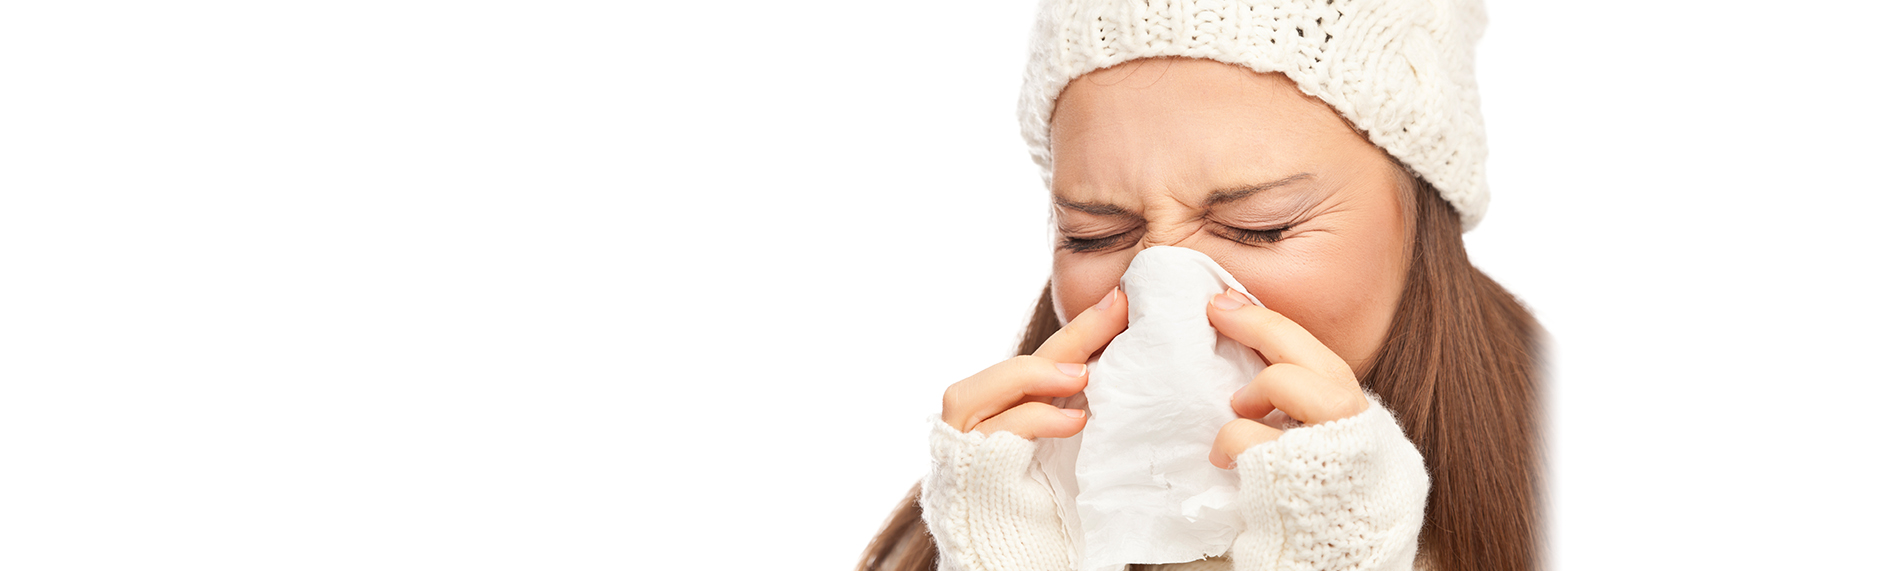 El aire seco te hace sentir mal